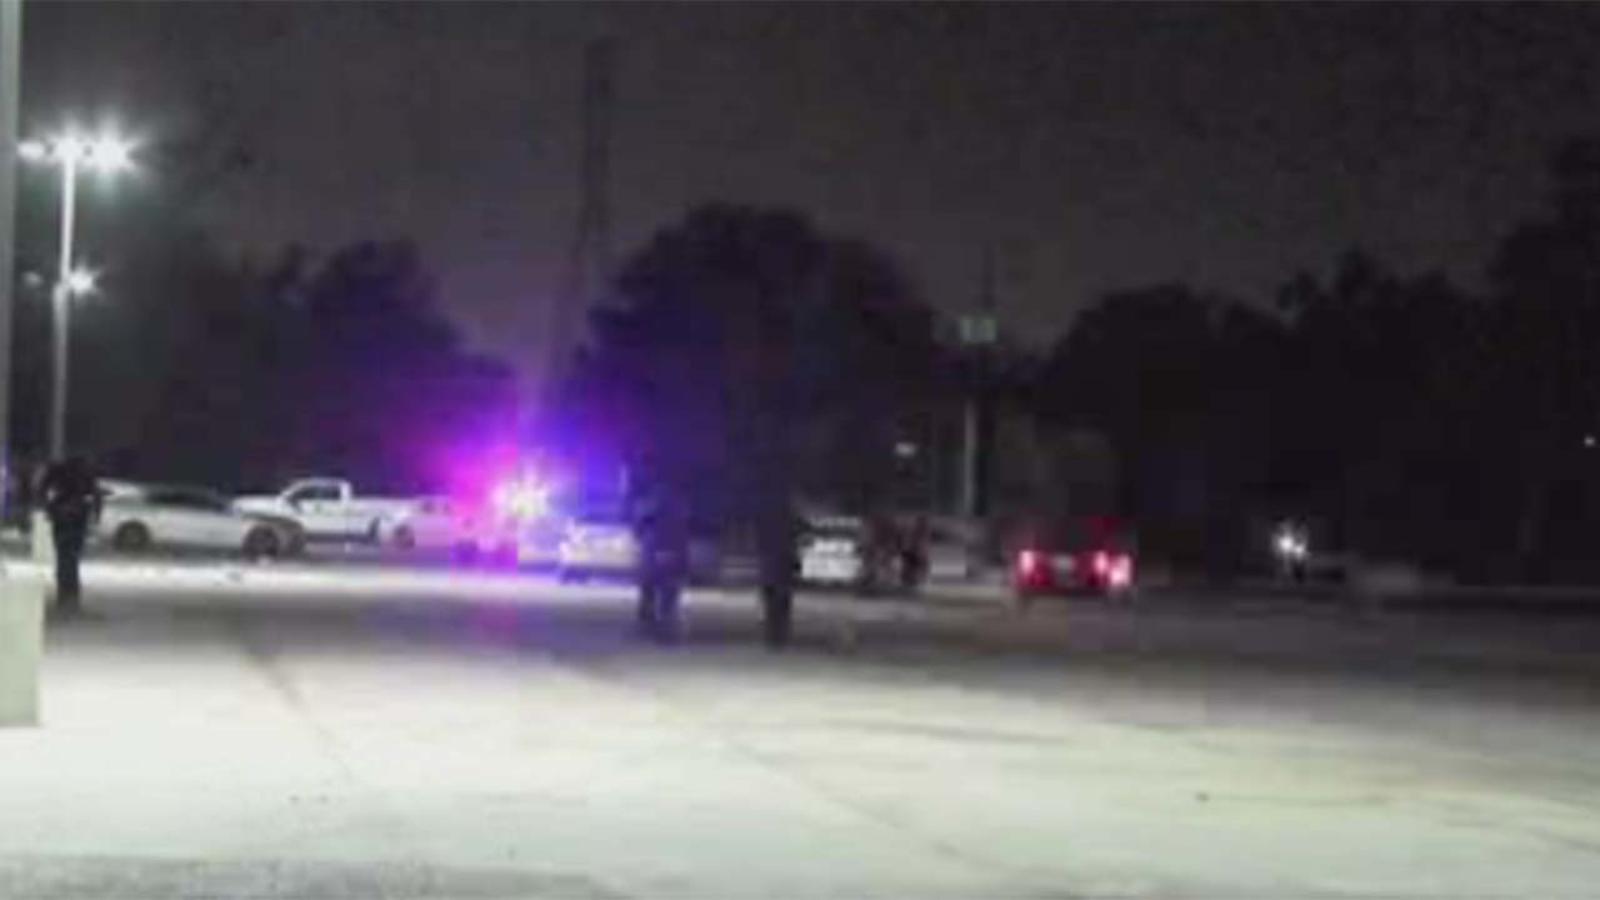 triple shooting in channelview leaves 1 man dead